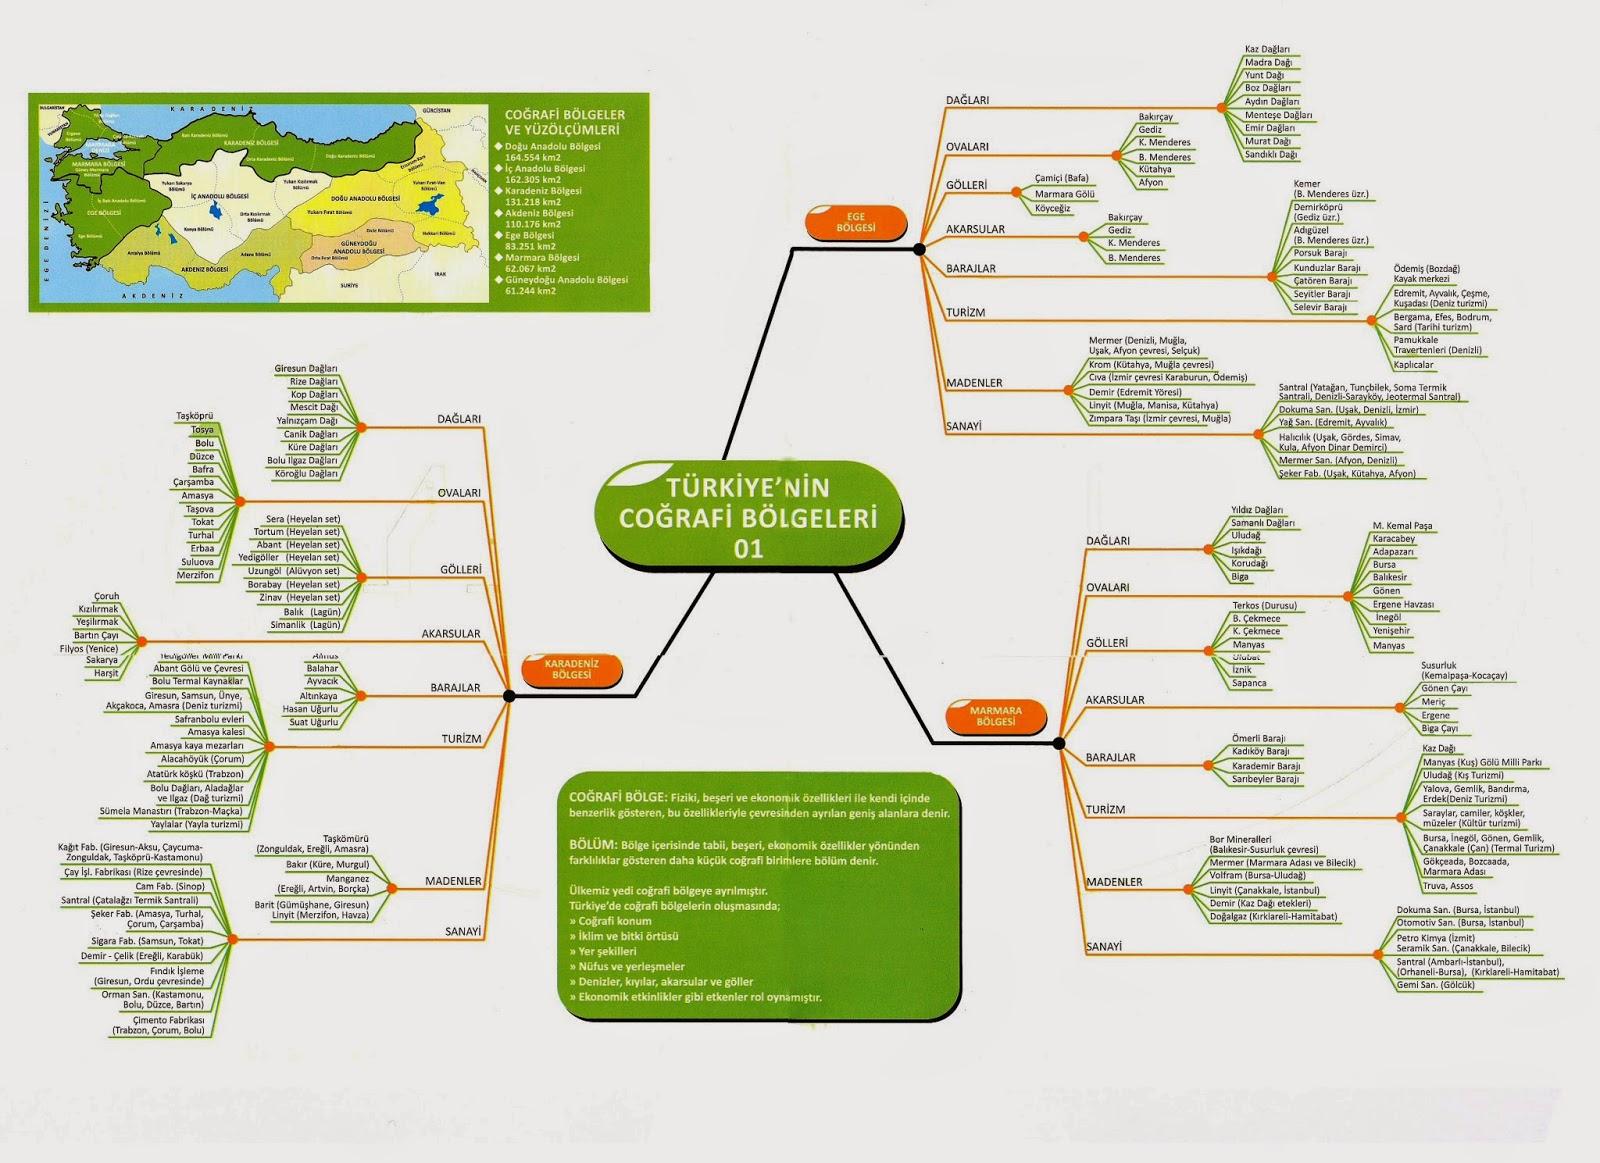 Kpss Platformu Cografya Kavram Haritalari 4 Turkiye Nin